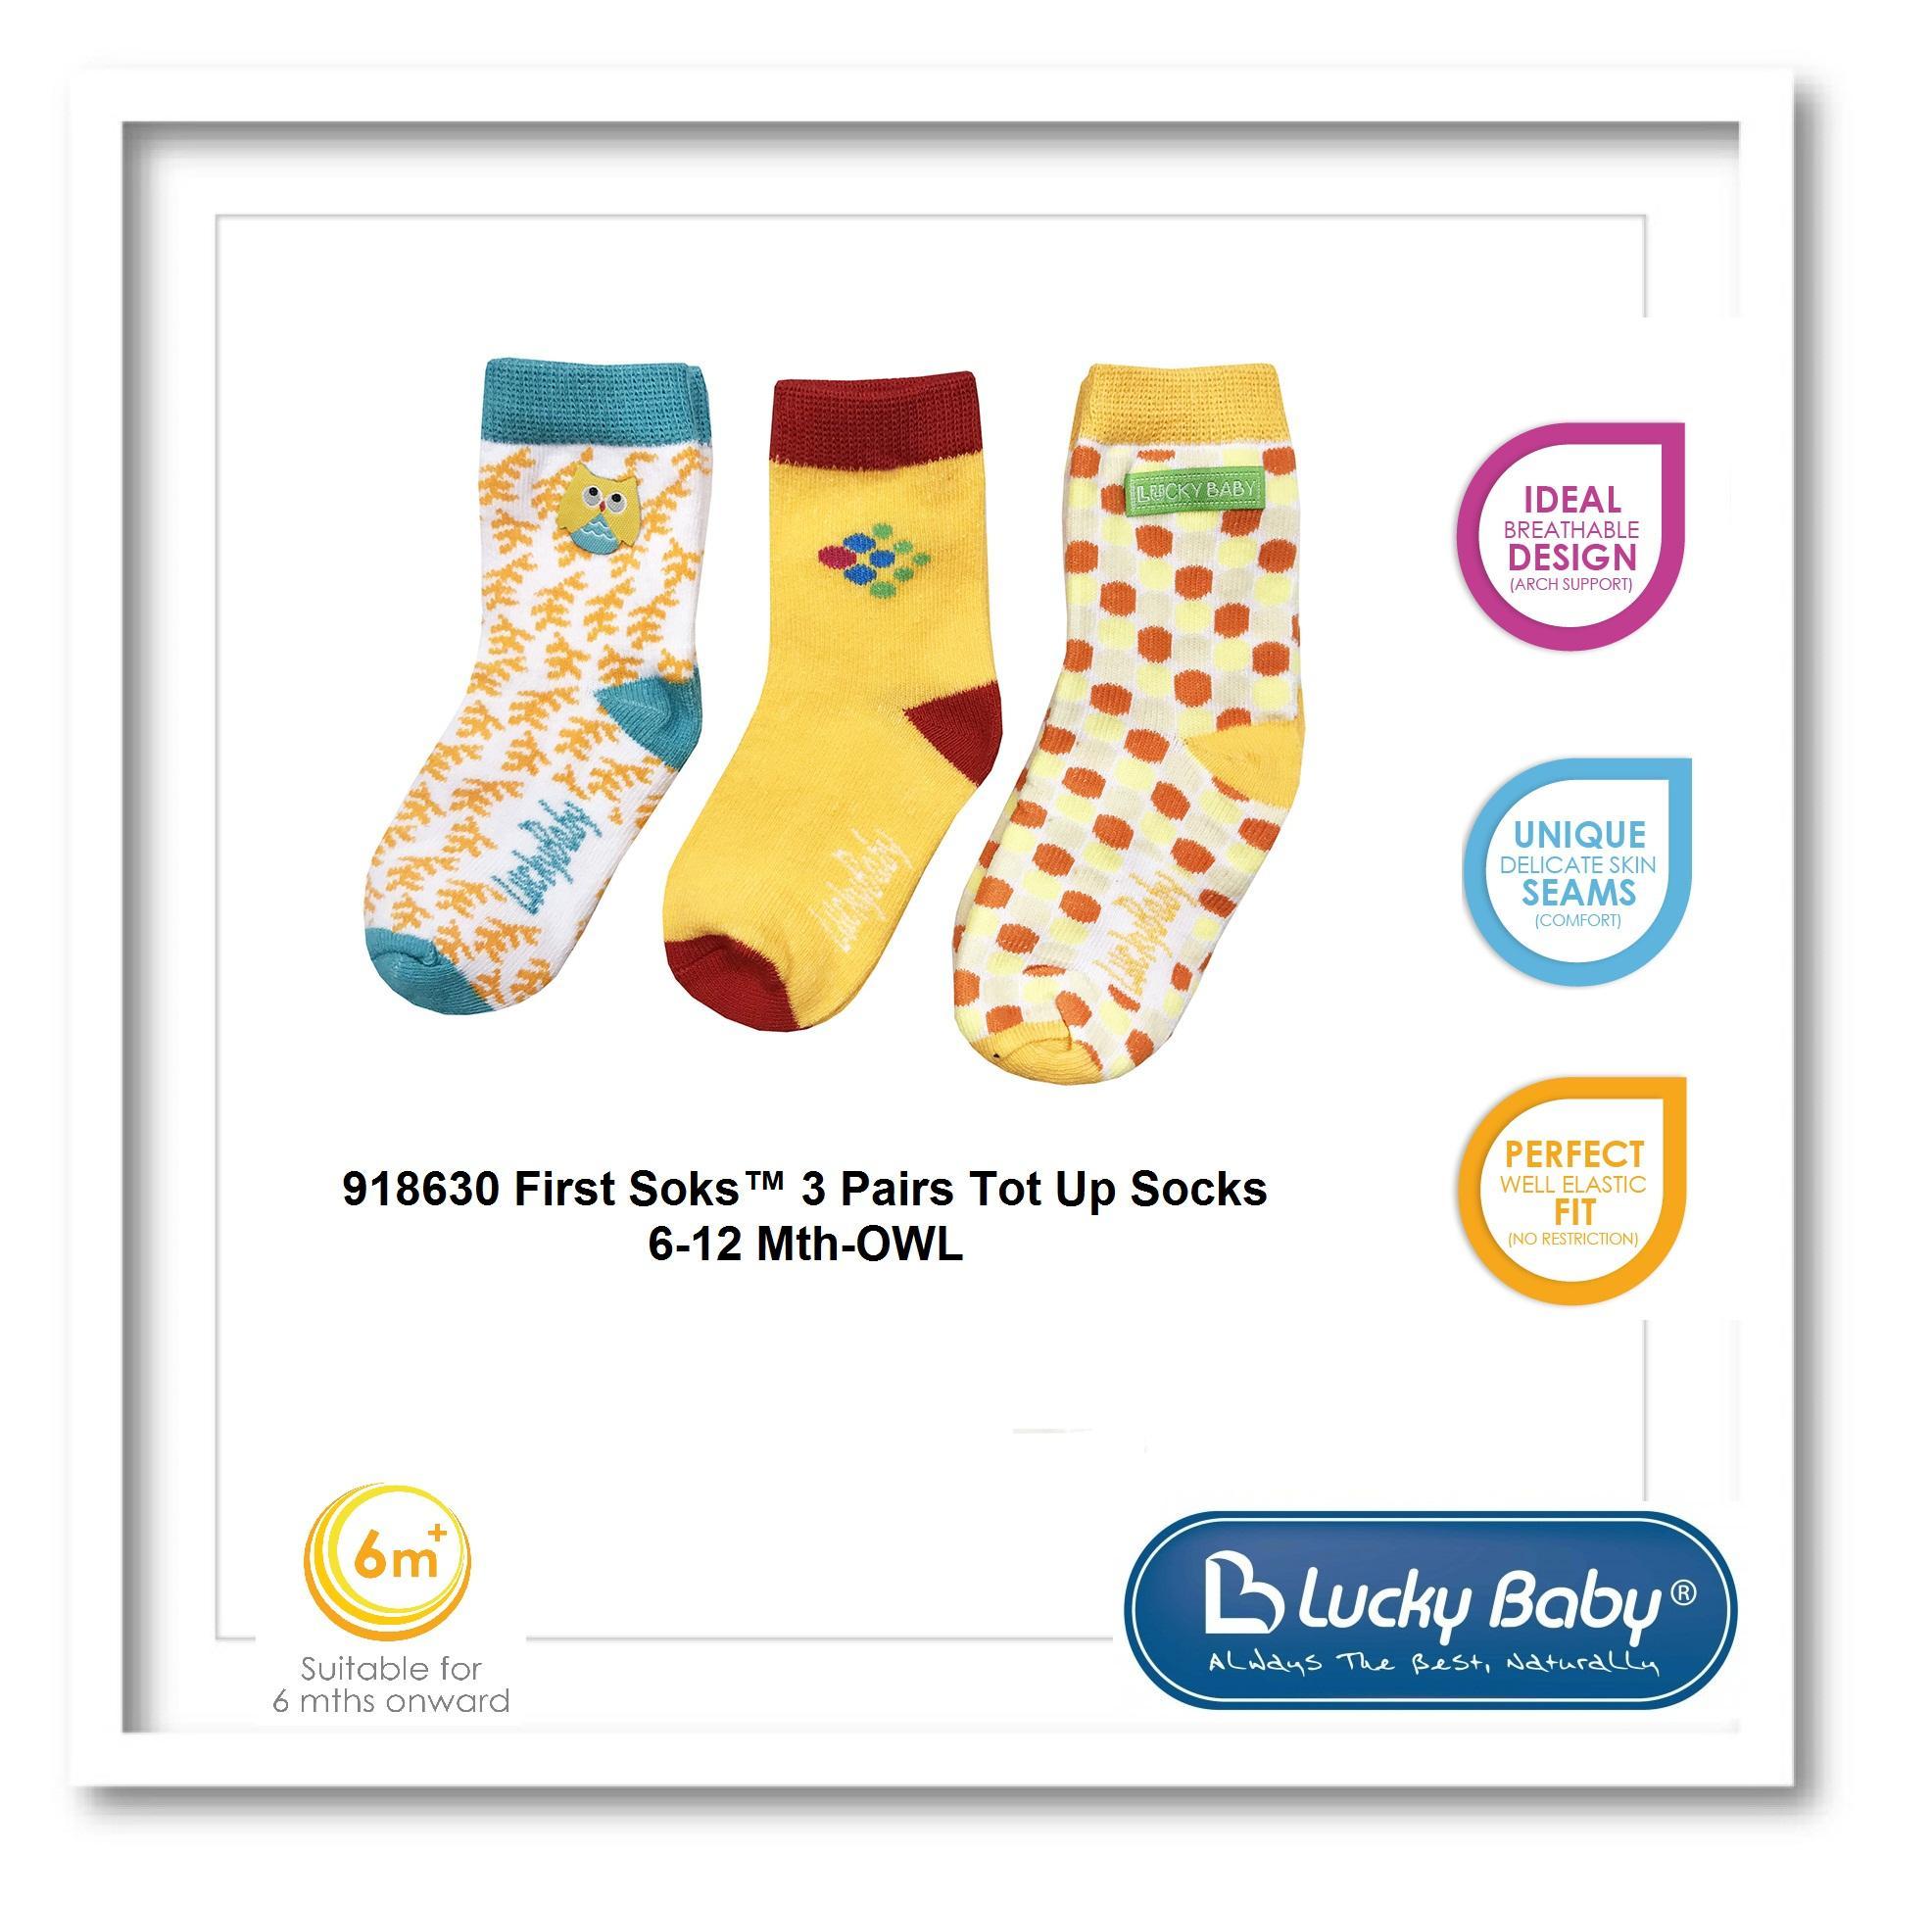 b116976f4c655 LICKY BABY @ 918630 First Soks™ 3 Pairs Tot Up Socks 6-12 Mth